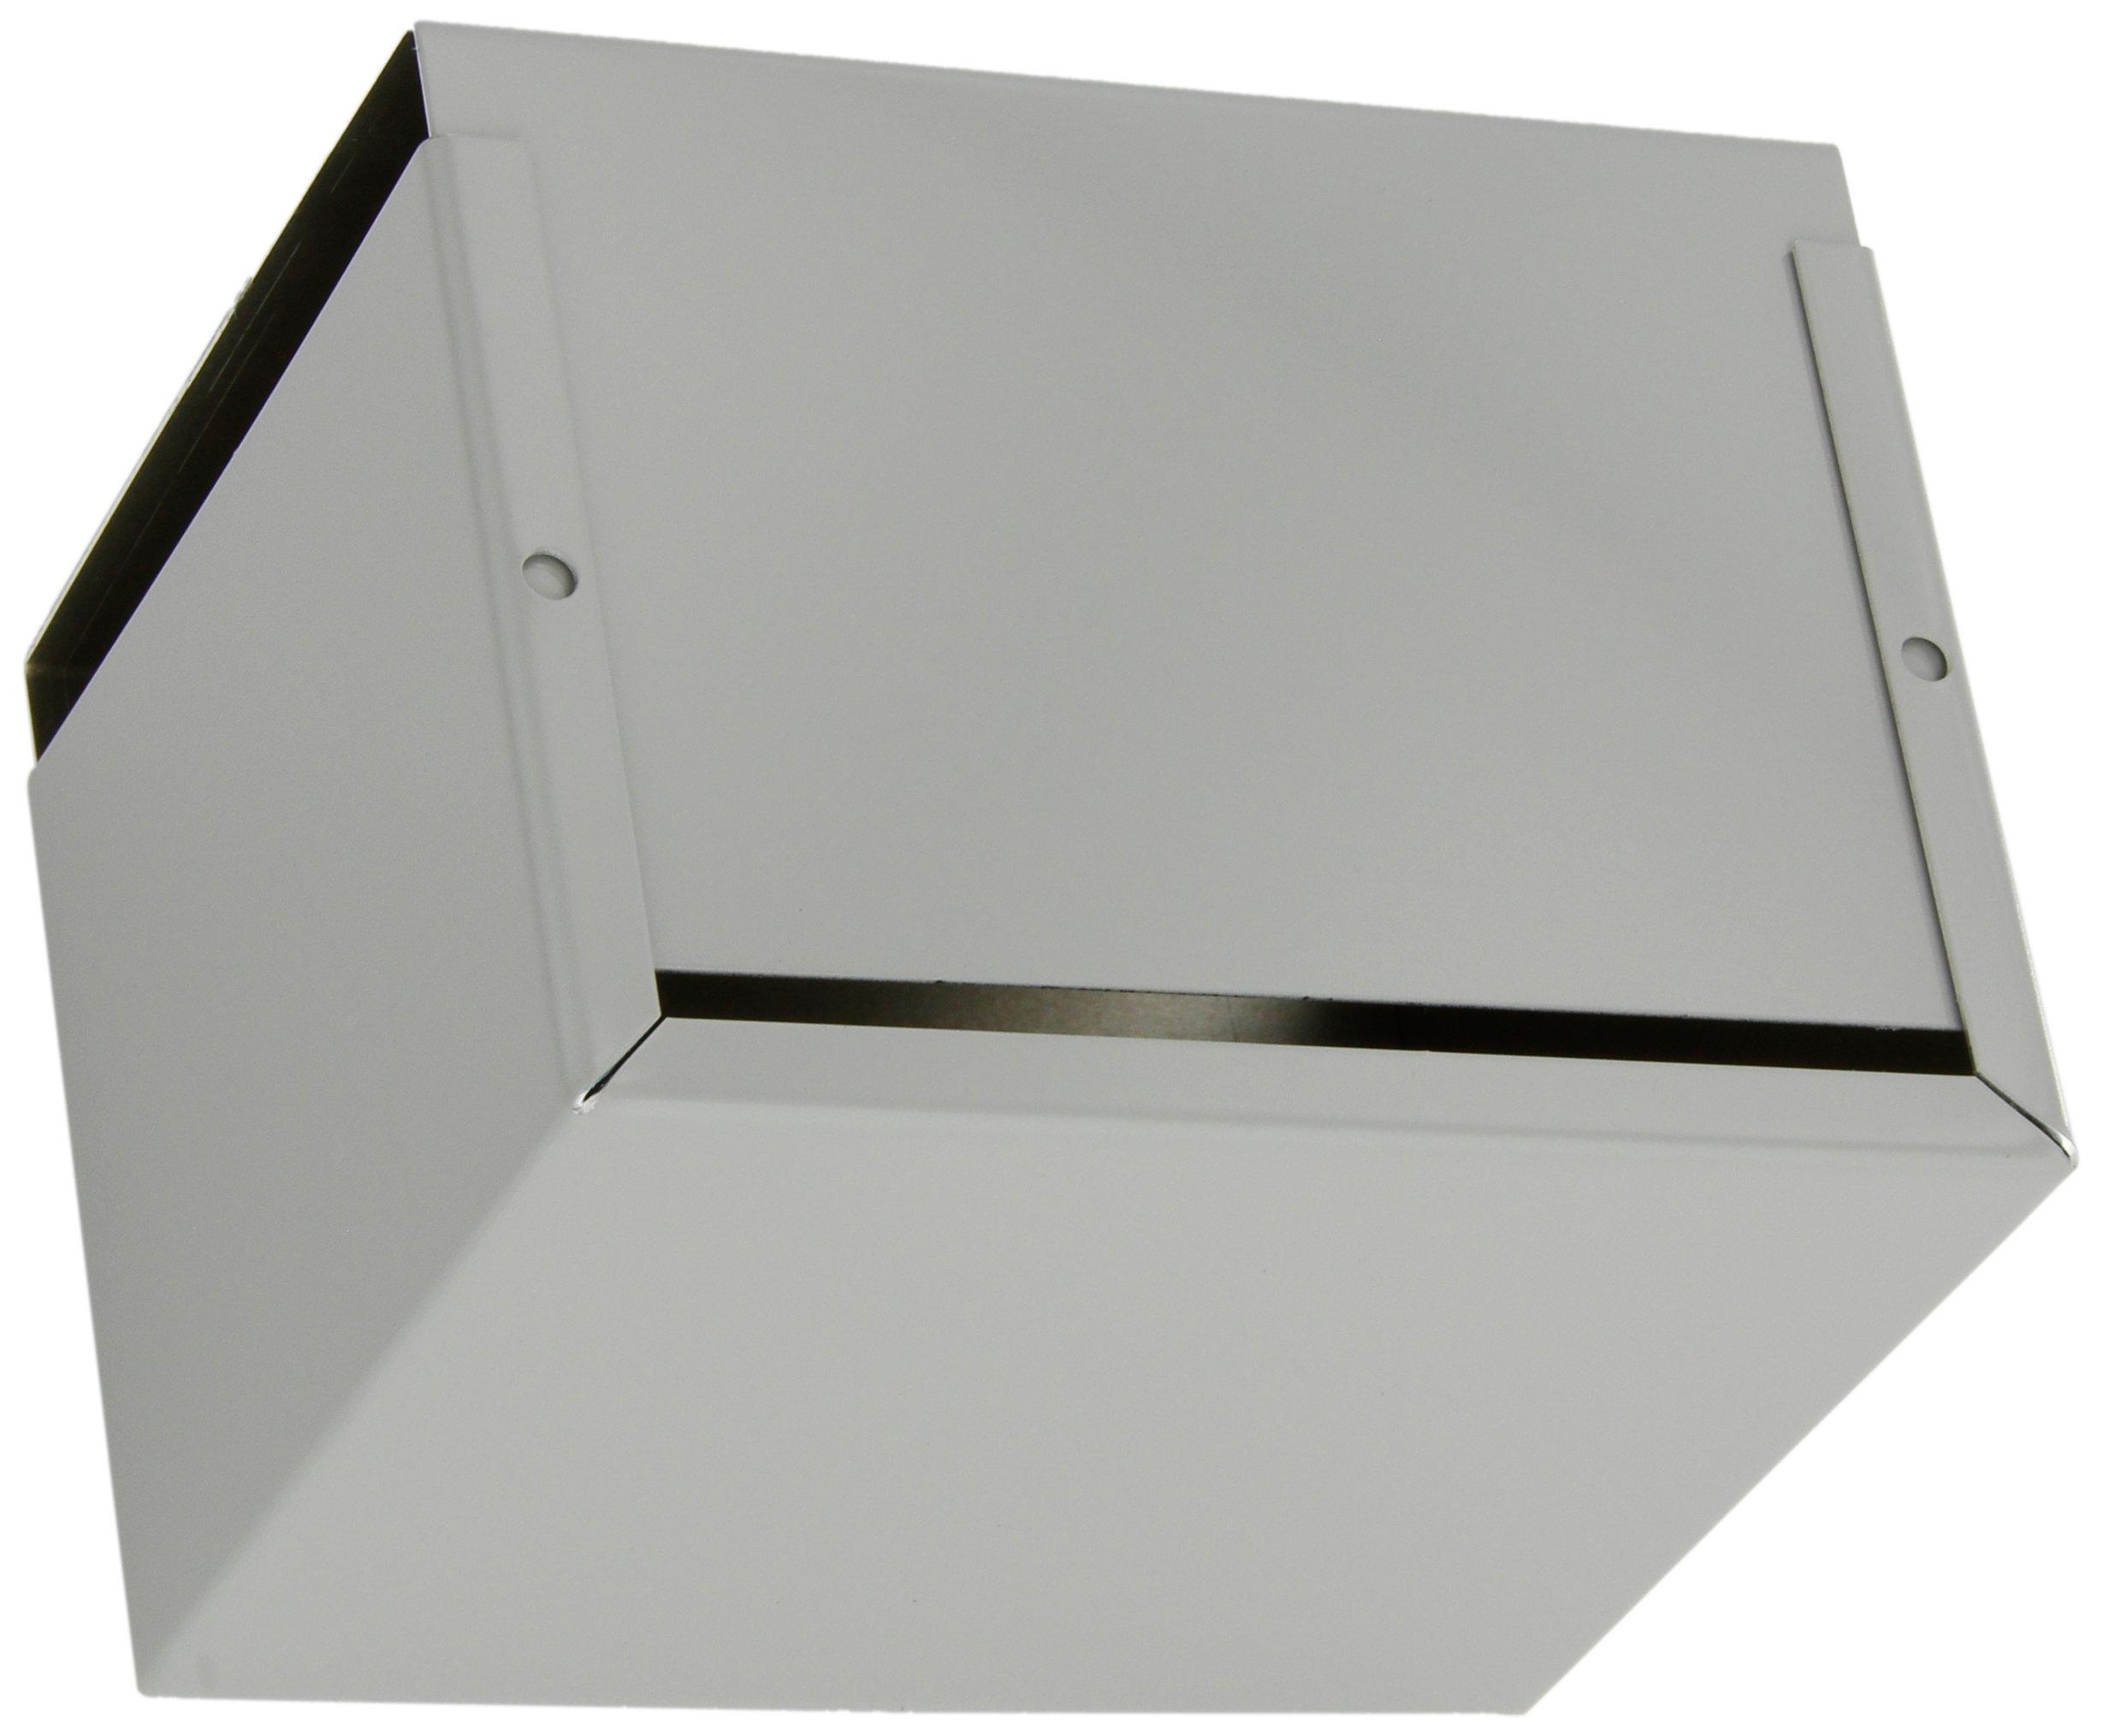 BUD Industries CU-2107-B Aluminum Electronics Minibox, 6'' Length x 5'' Width x 4'' Height, Smooth Gray Finish